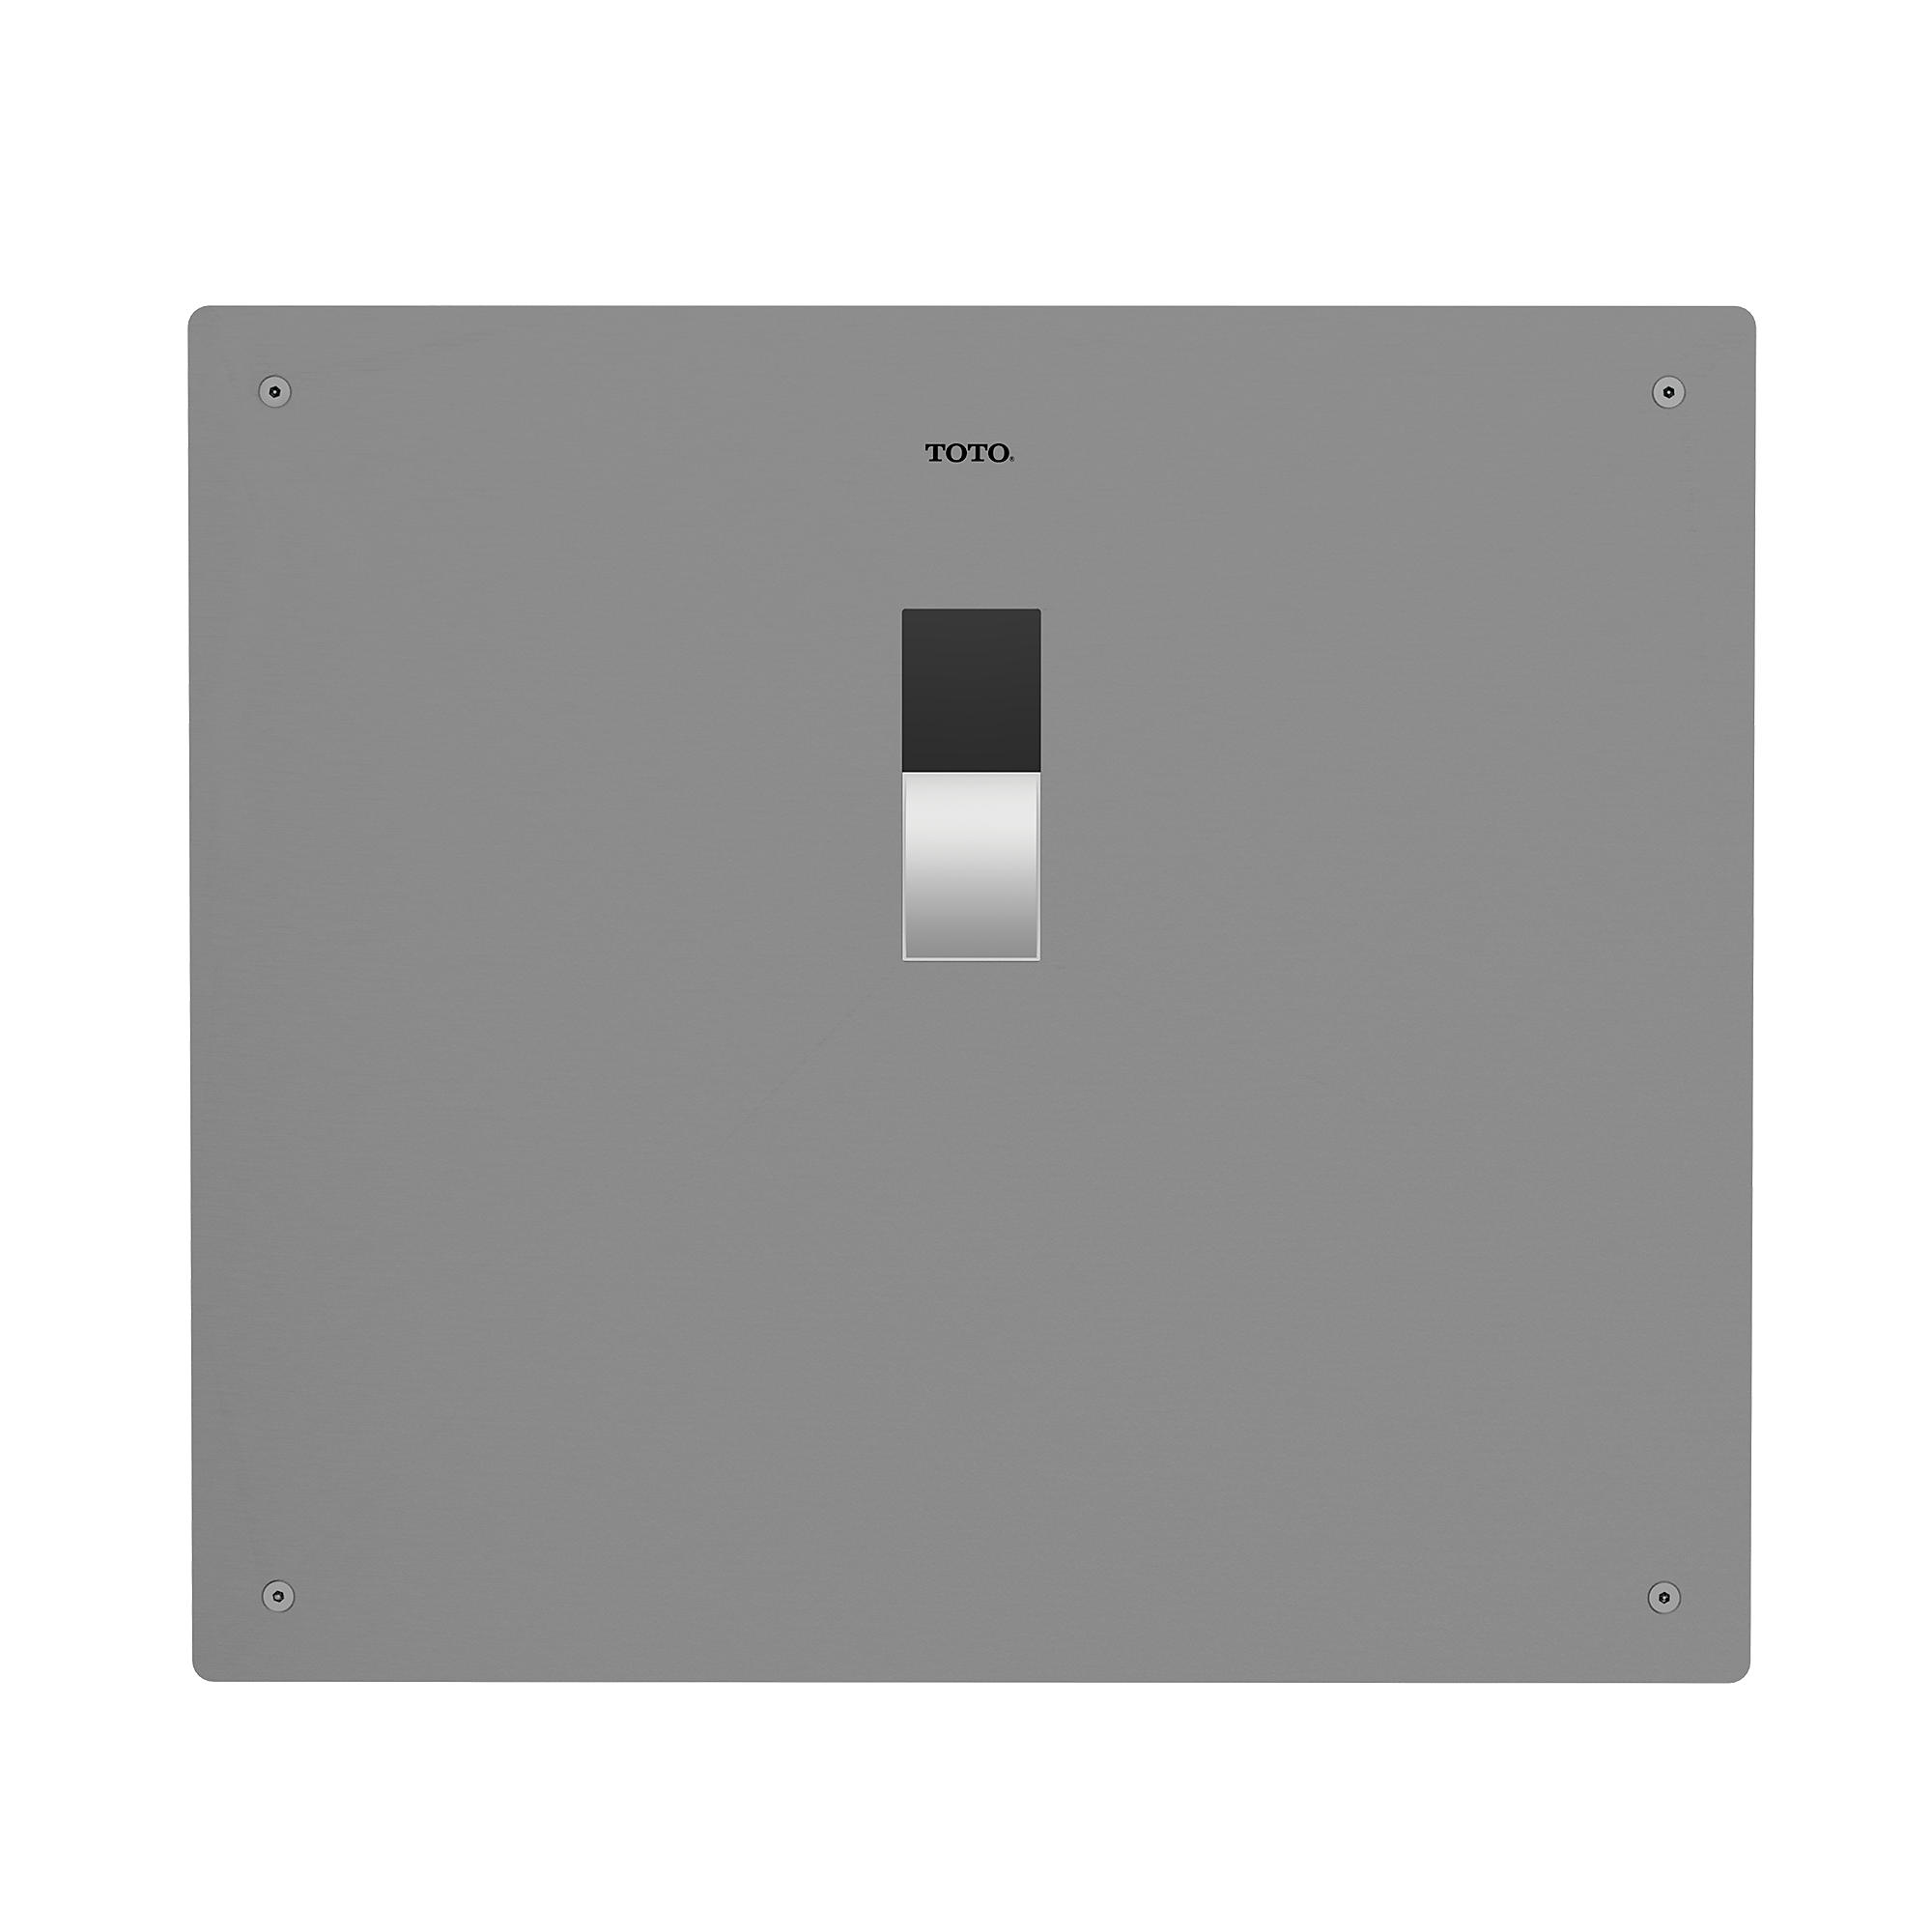 Tet2la ss ecopower  high efficiency concealed toilet flush valve only  1 28 gpf 0